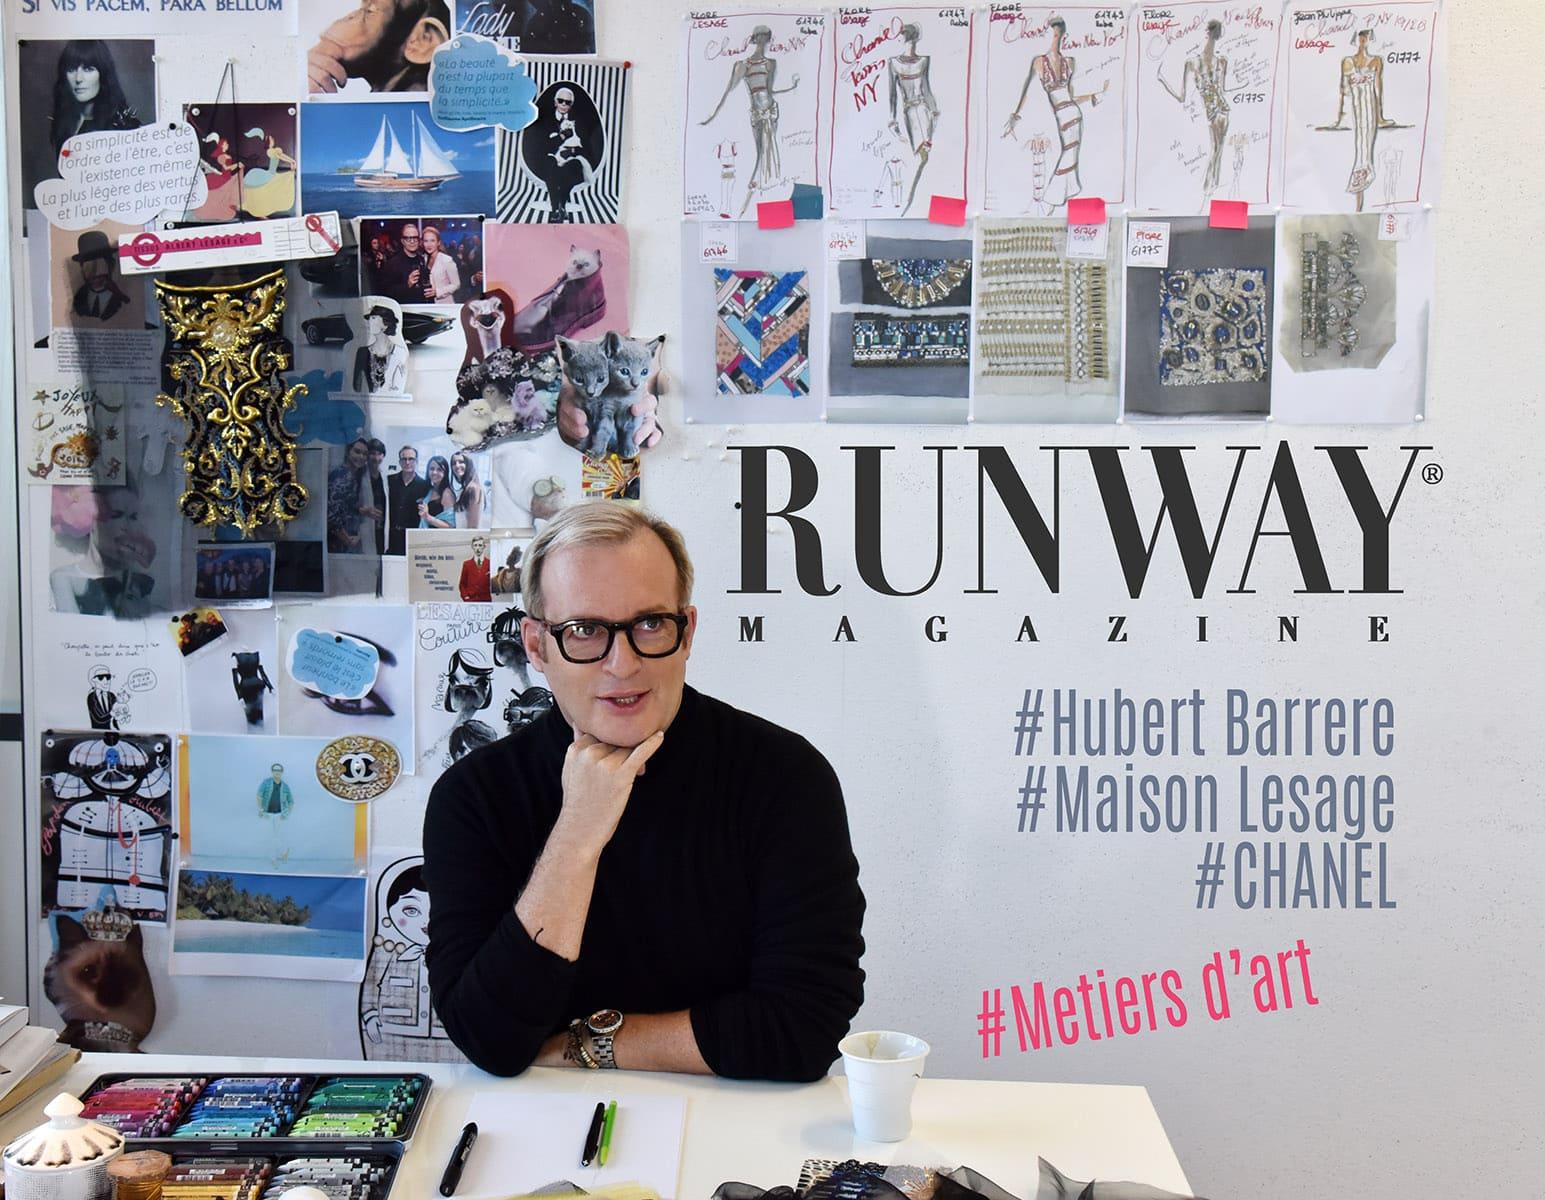 Hubert Barrere Story of Maison Lesage by Ruwnay Magazine